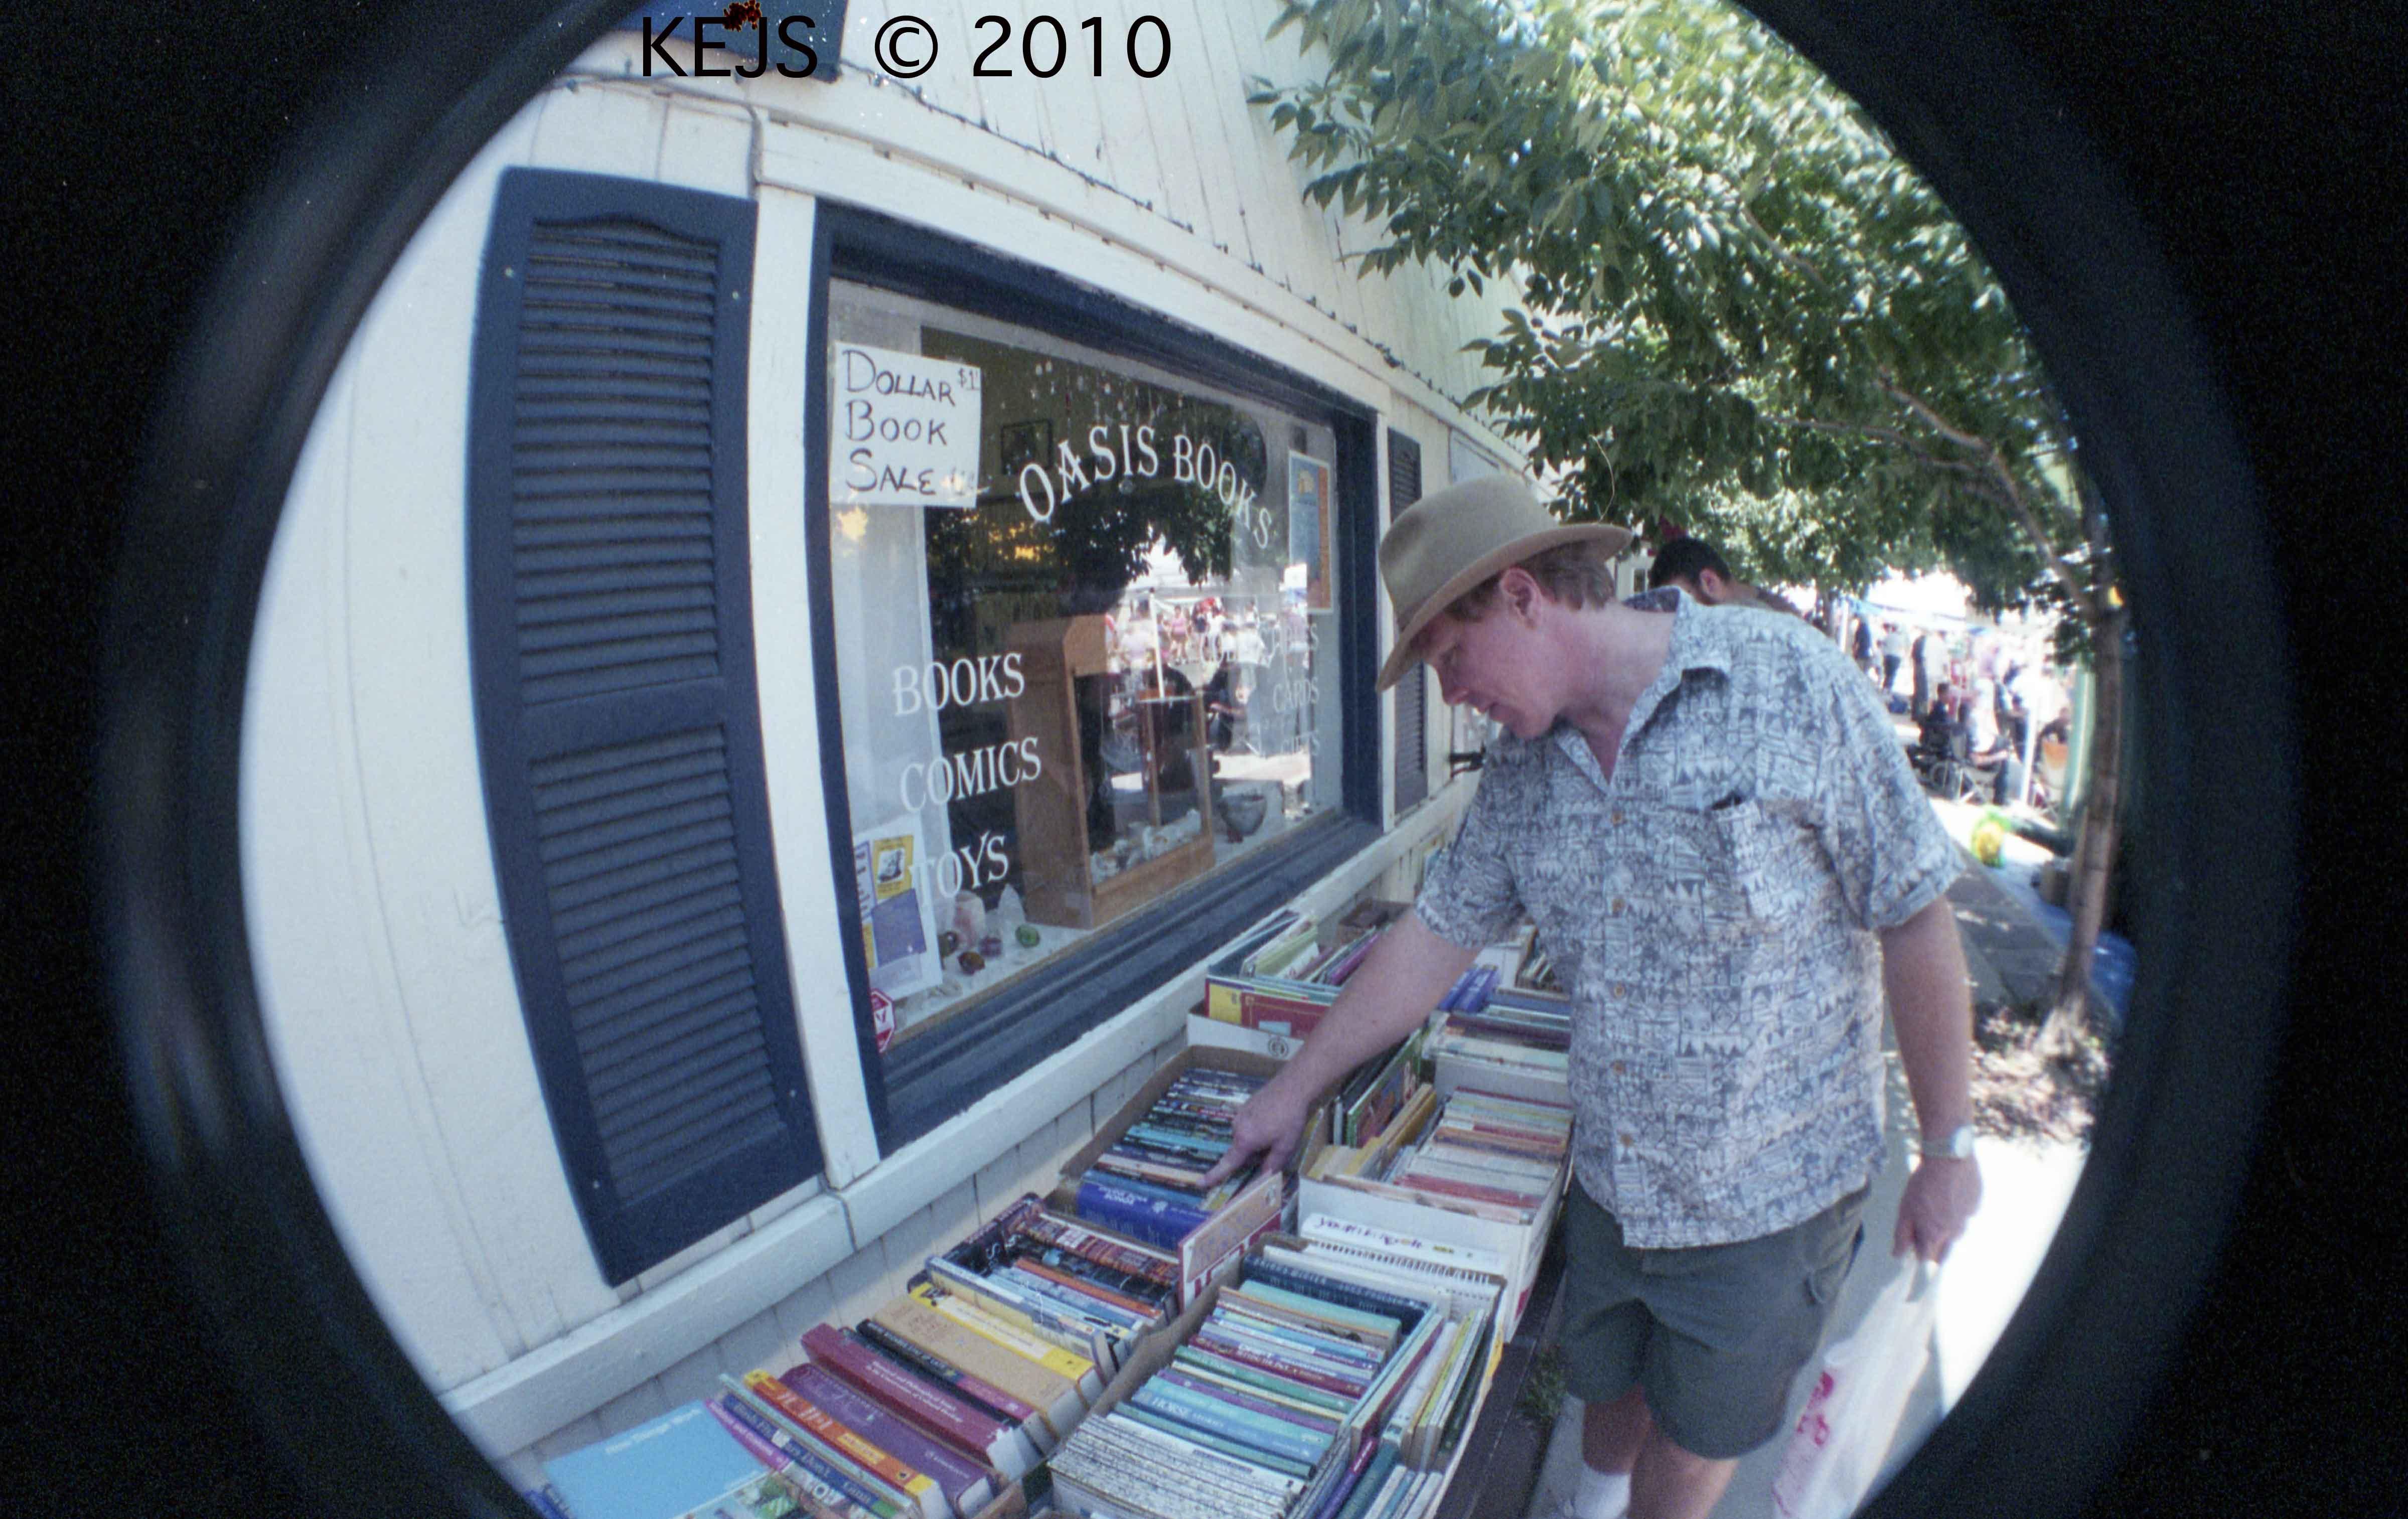 PeachesBooks